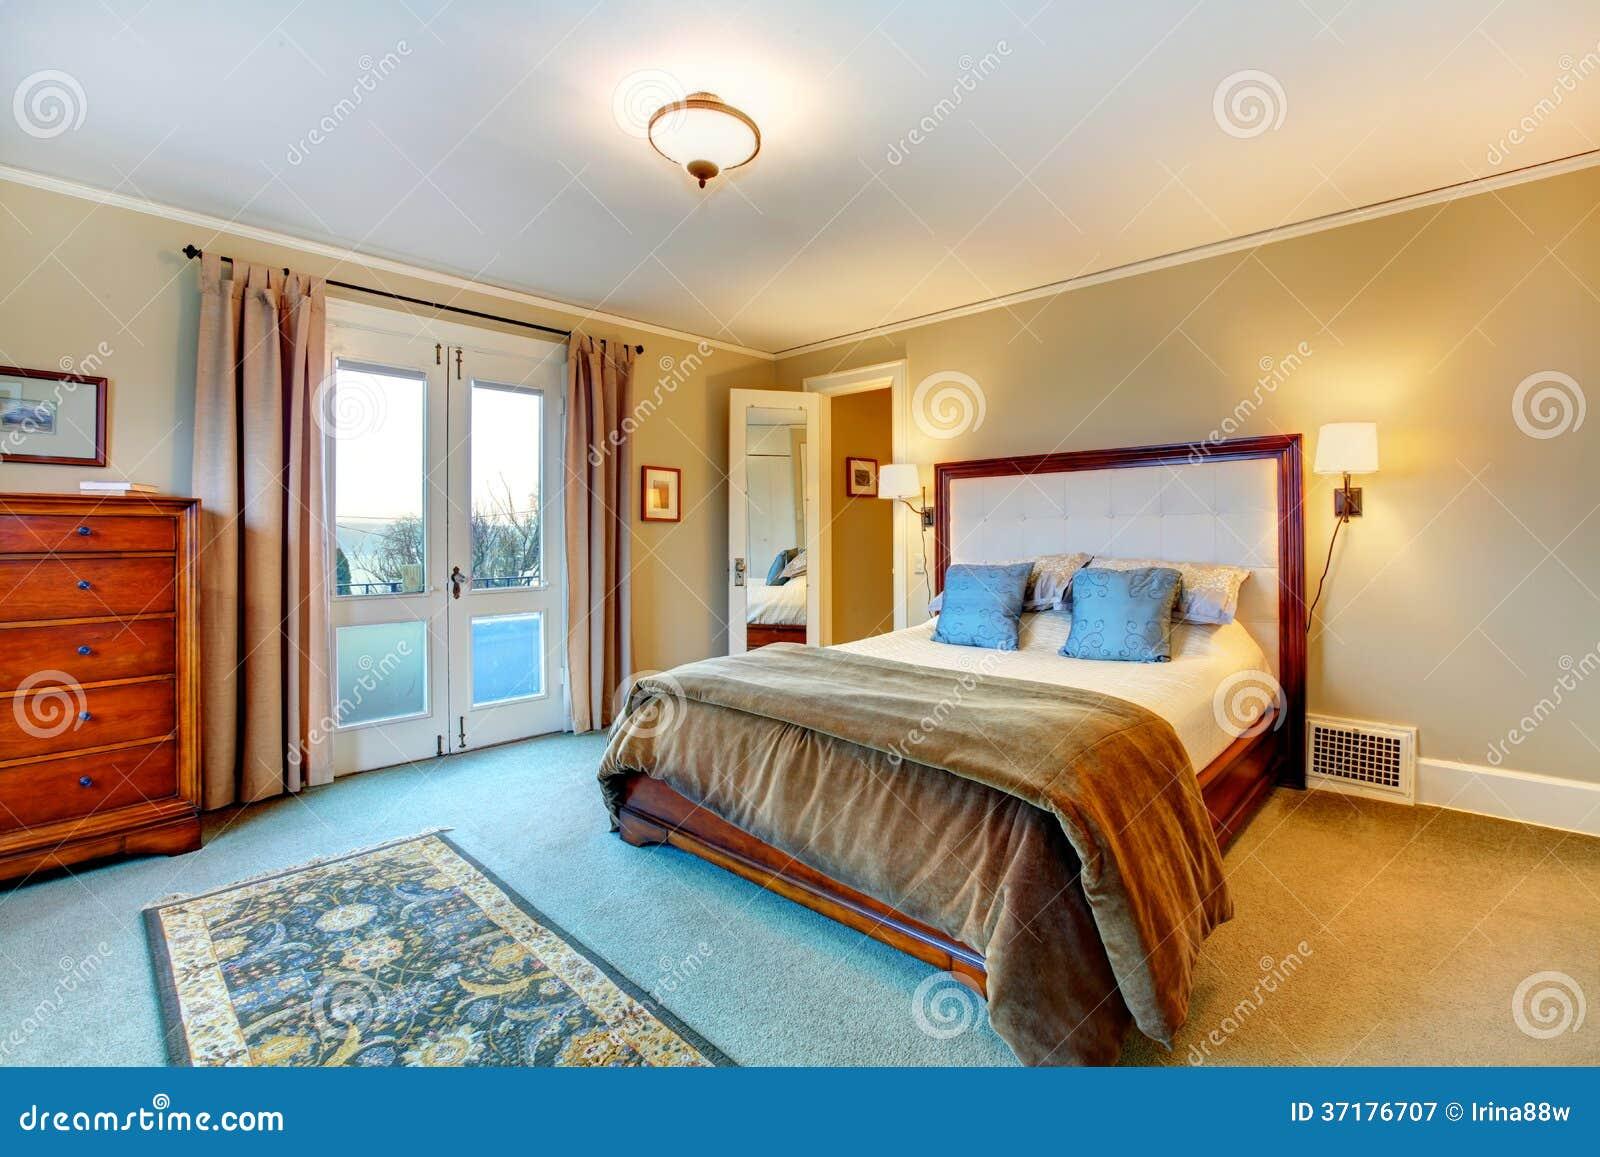 Elegante warme kleuren geleverde slaapkamer stock afbeelding afbeelding 37176707 - Warme kleuren kamer ...